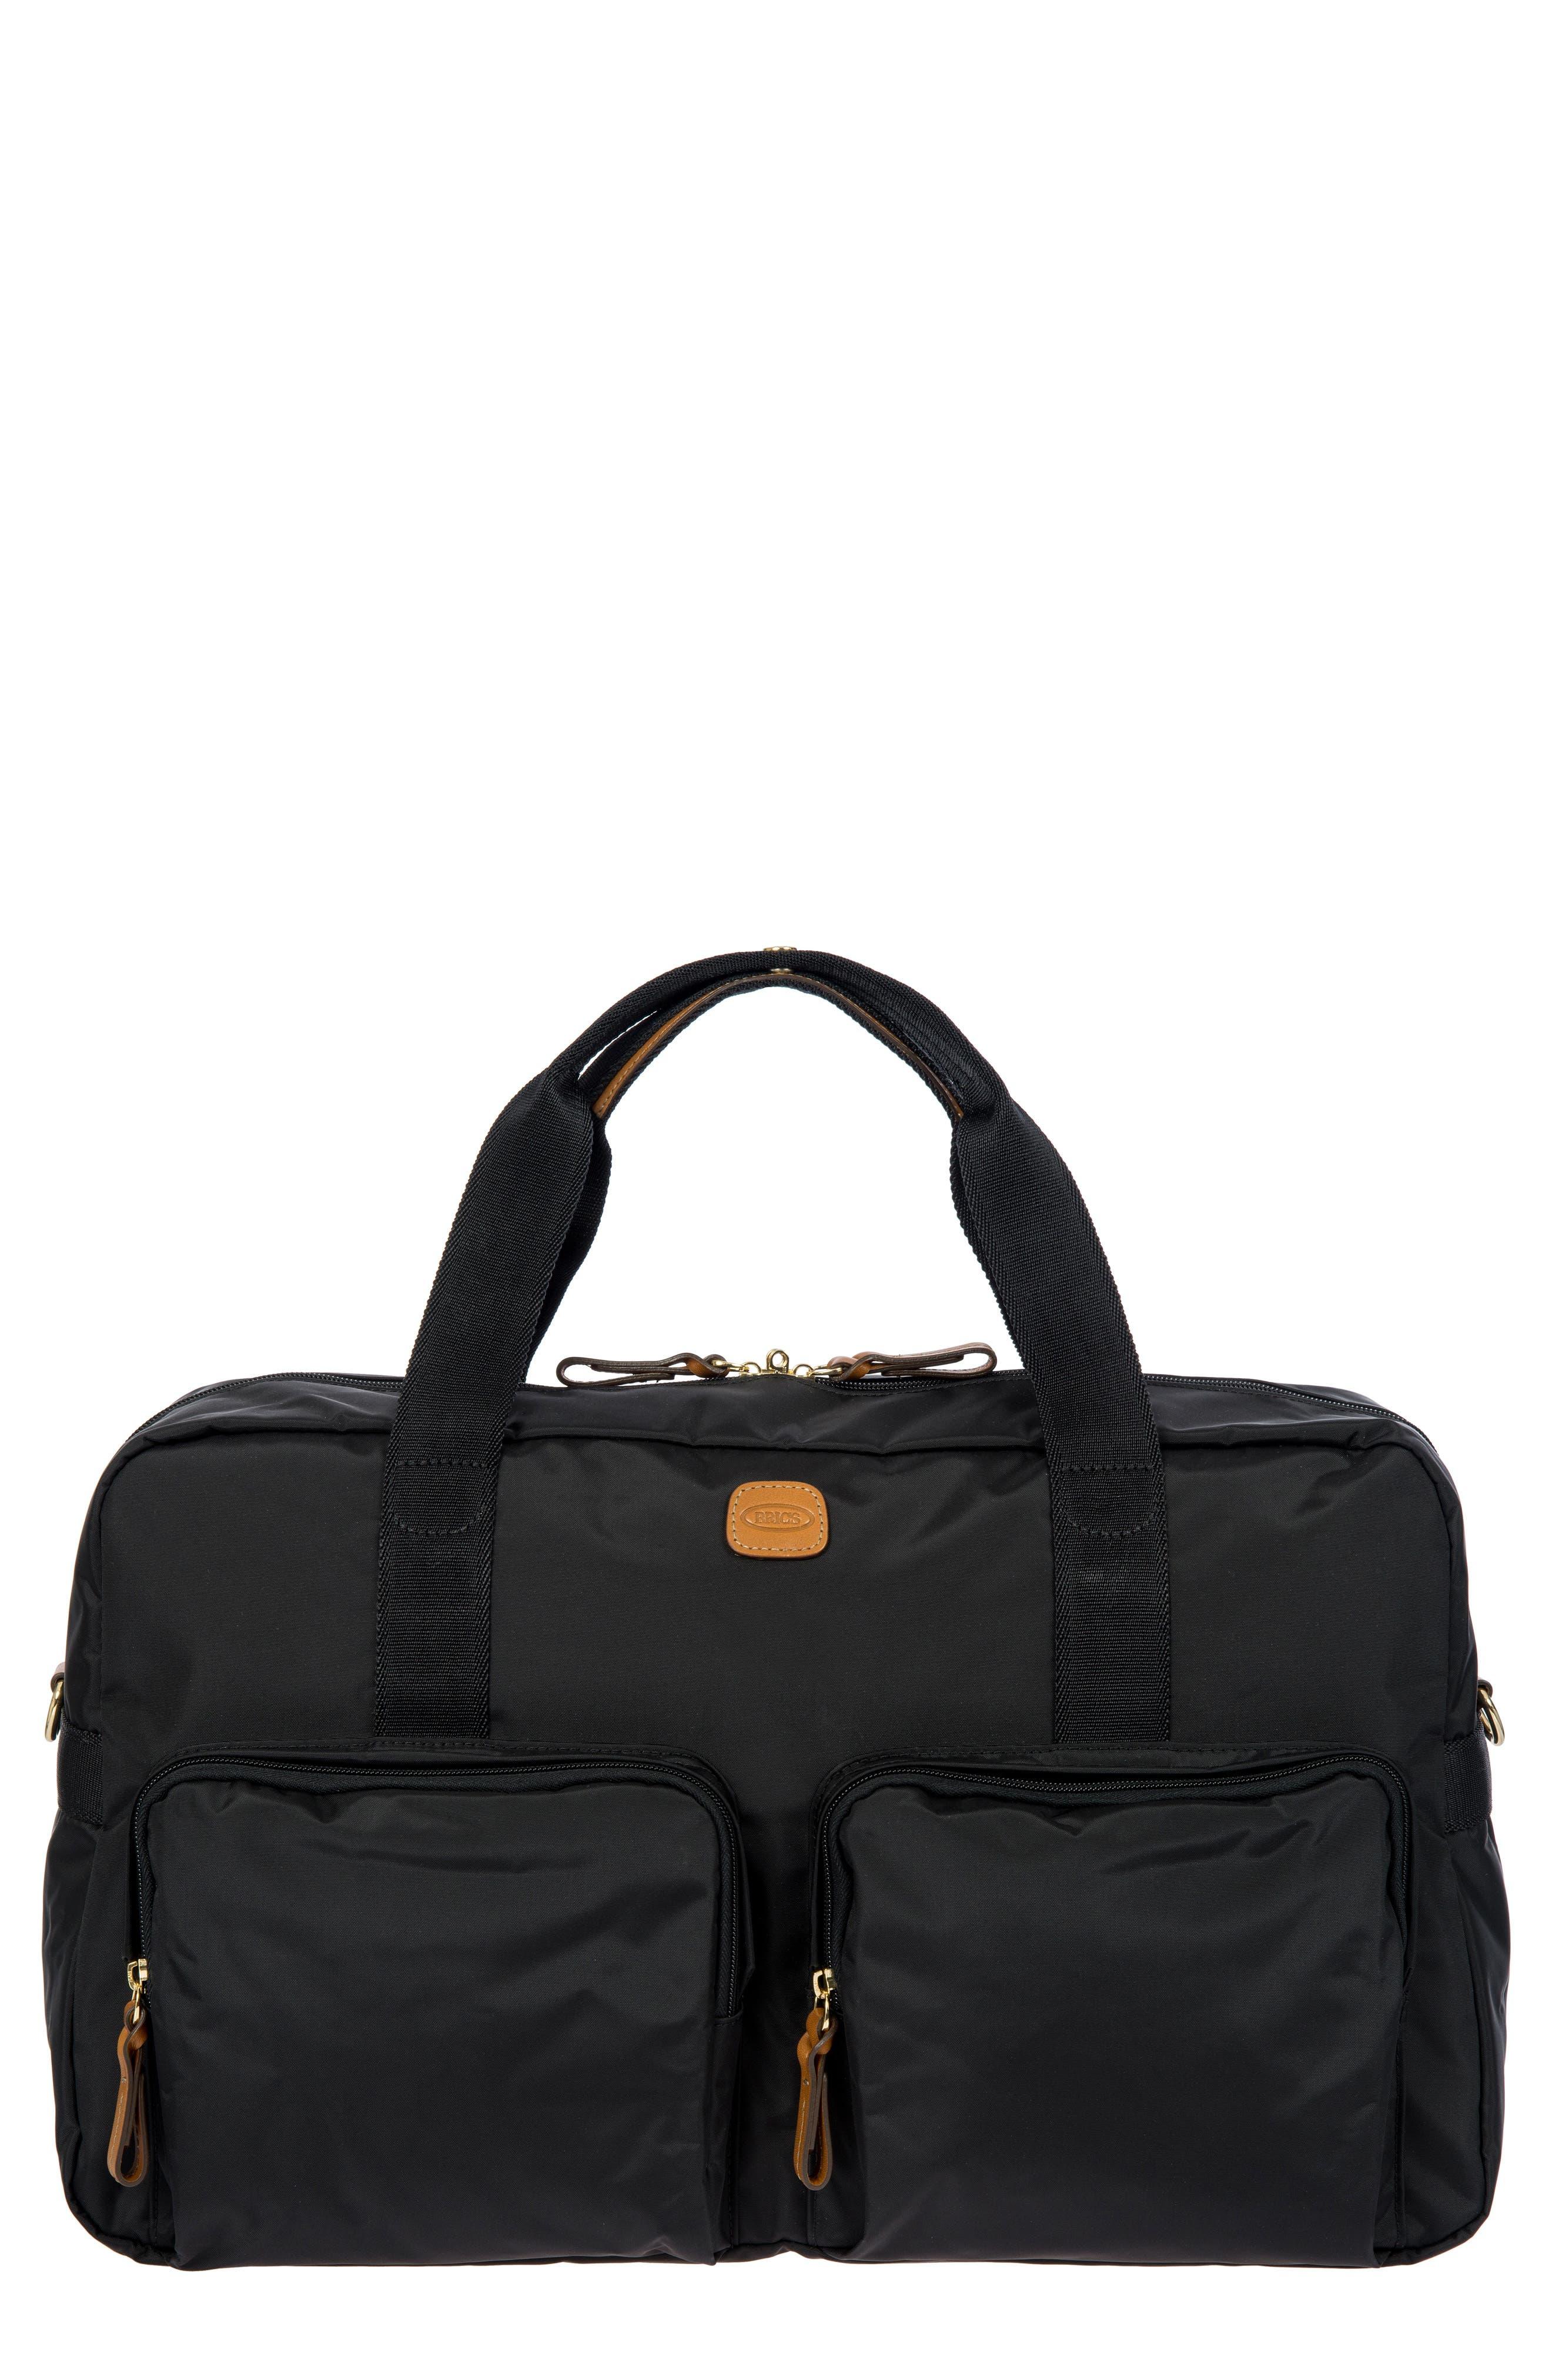 X-Bag Boarding 18-Inch Duffel Bag,                             Main thumbnail 1, color,                             Black